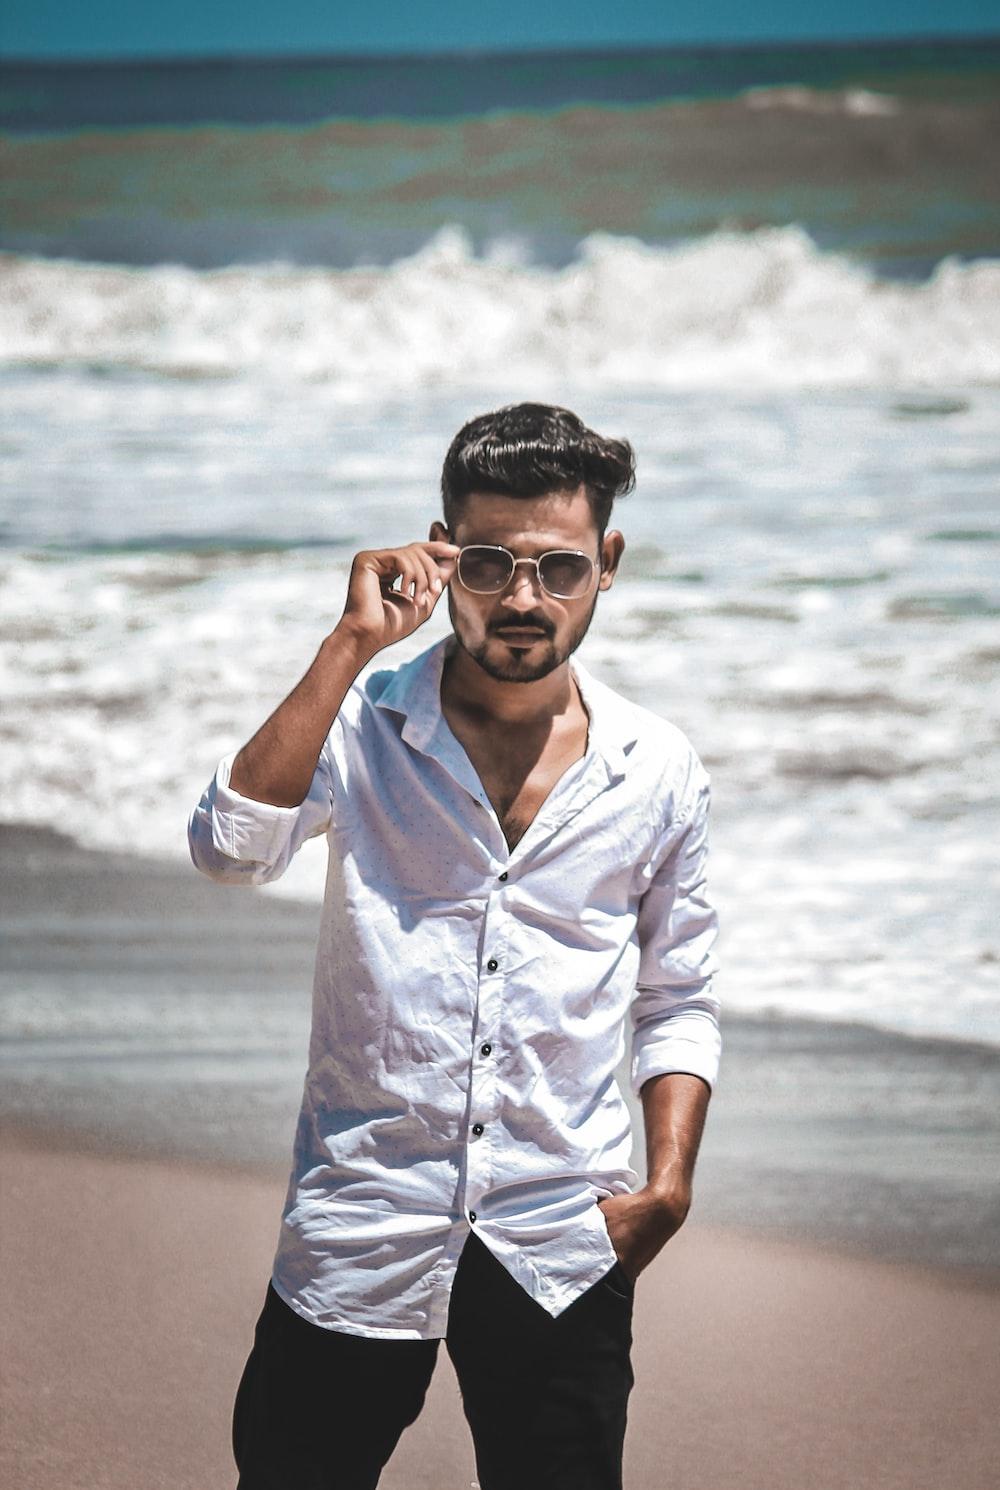 man in white dress shirt wearing black sunglasses standing on beach during daytime